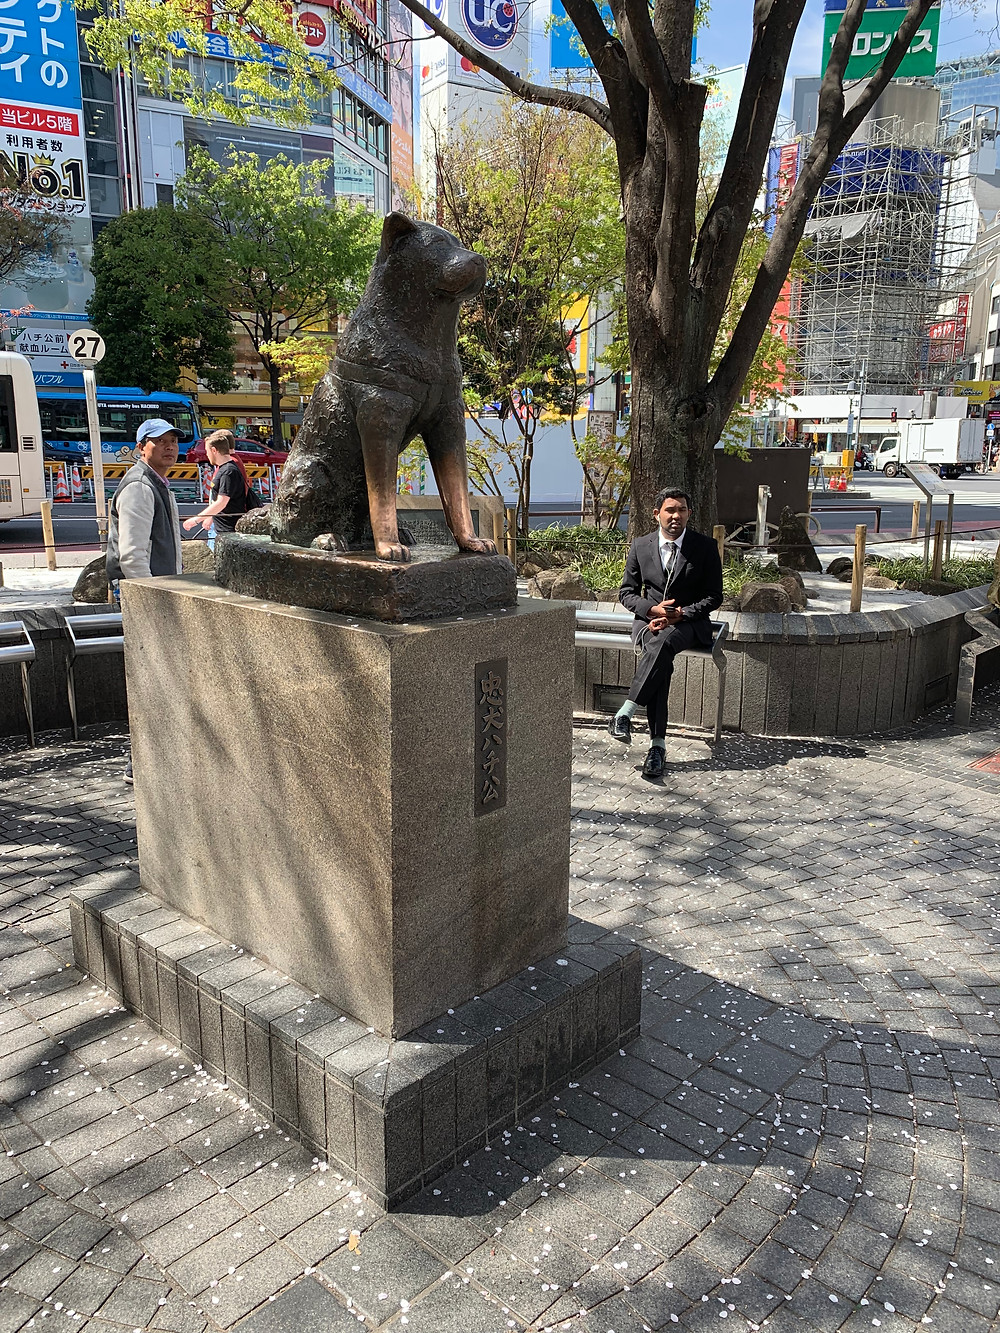 Statue of Hachiko at Shibuya station